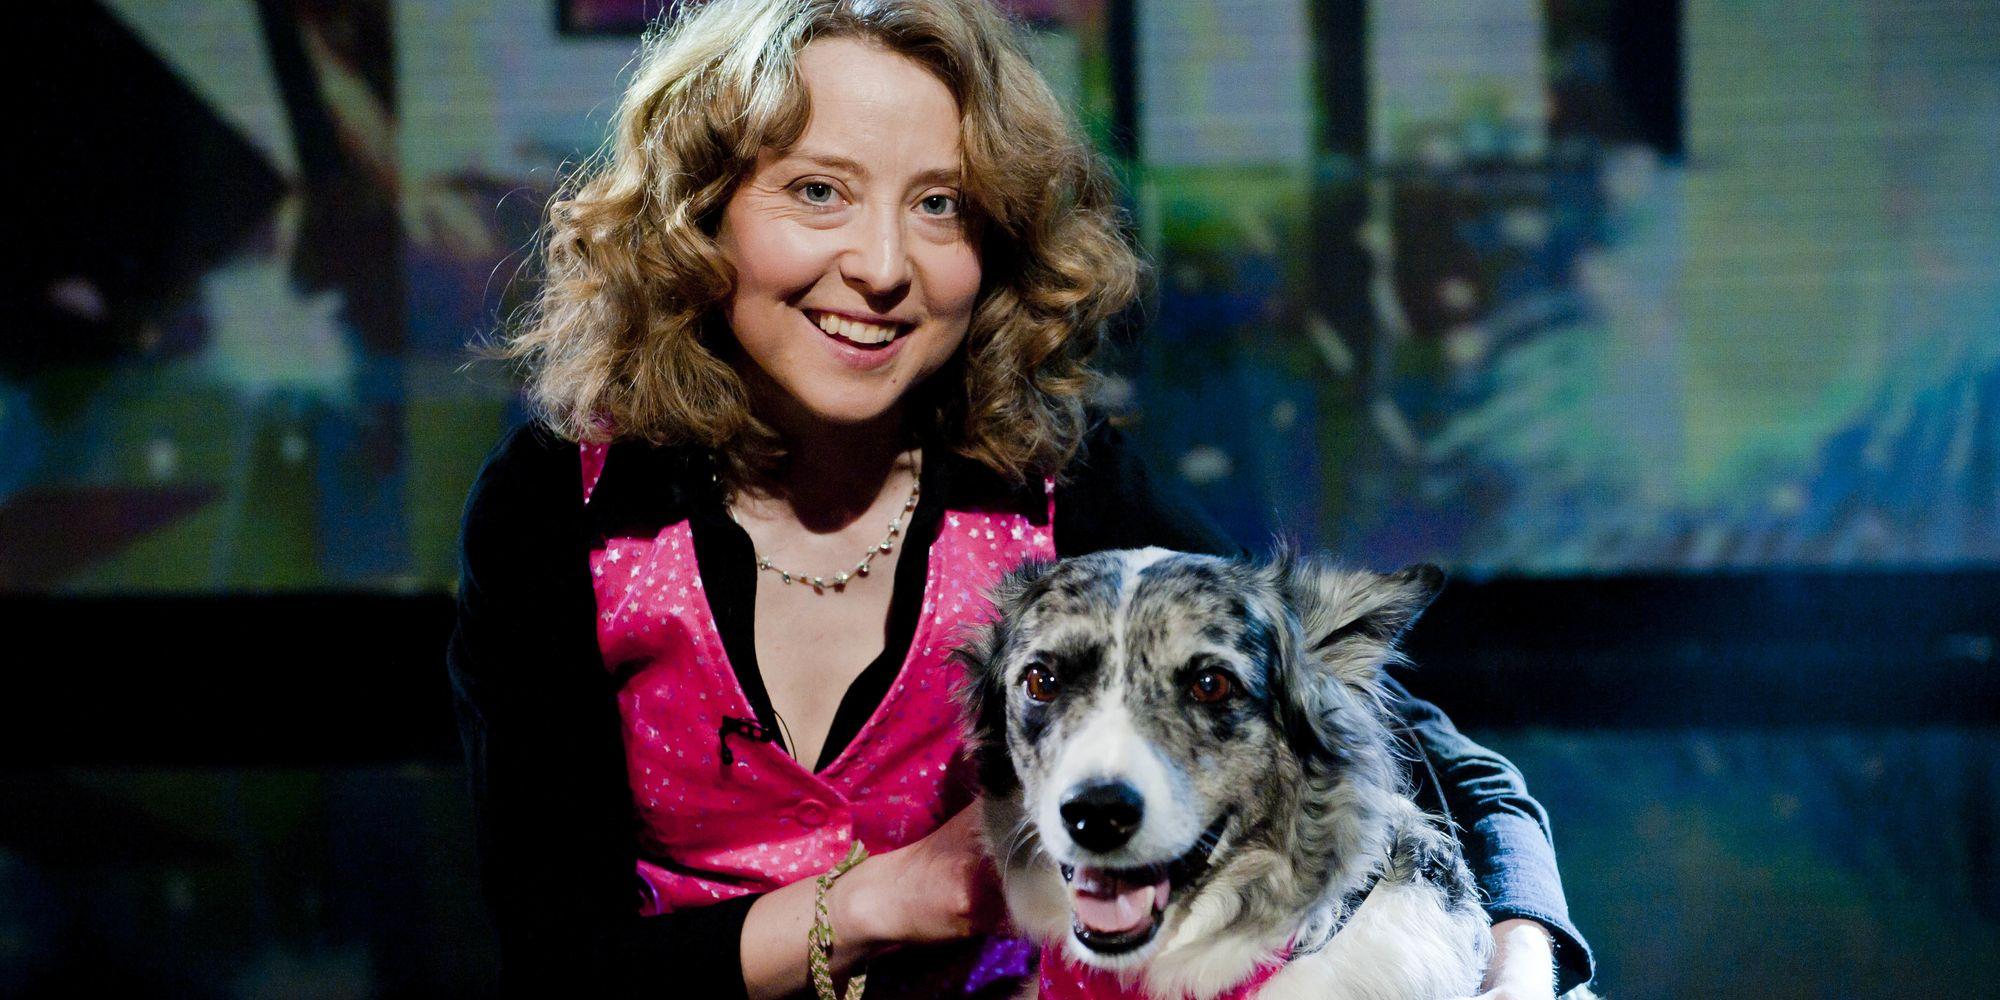 'Britain's Got Talent' Former Finalist Tina Humphrey Dies, Aged 45